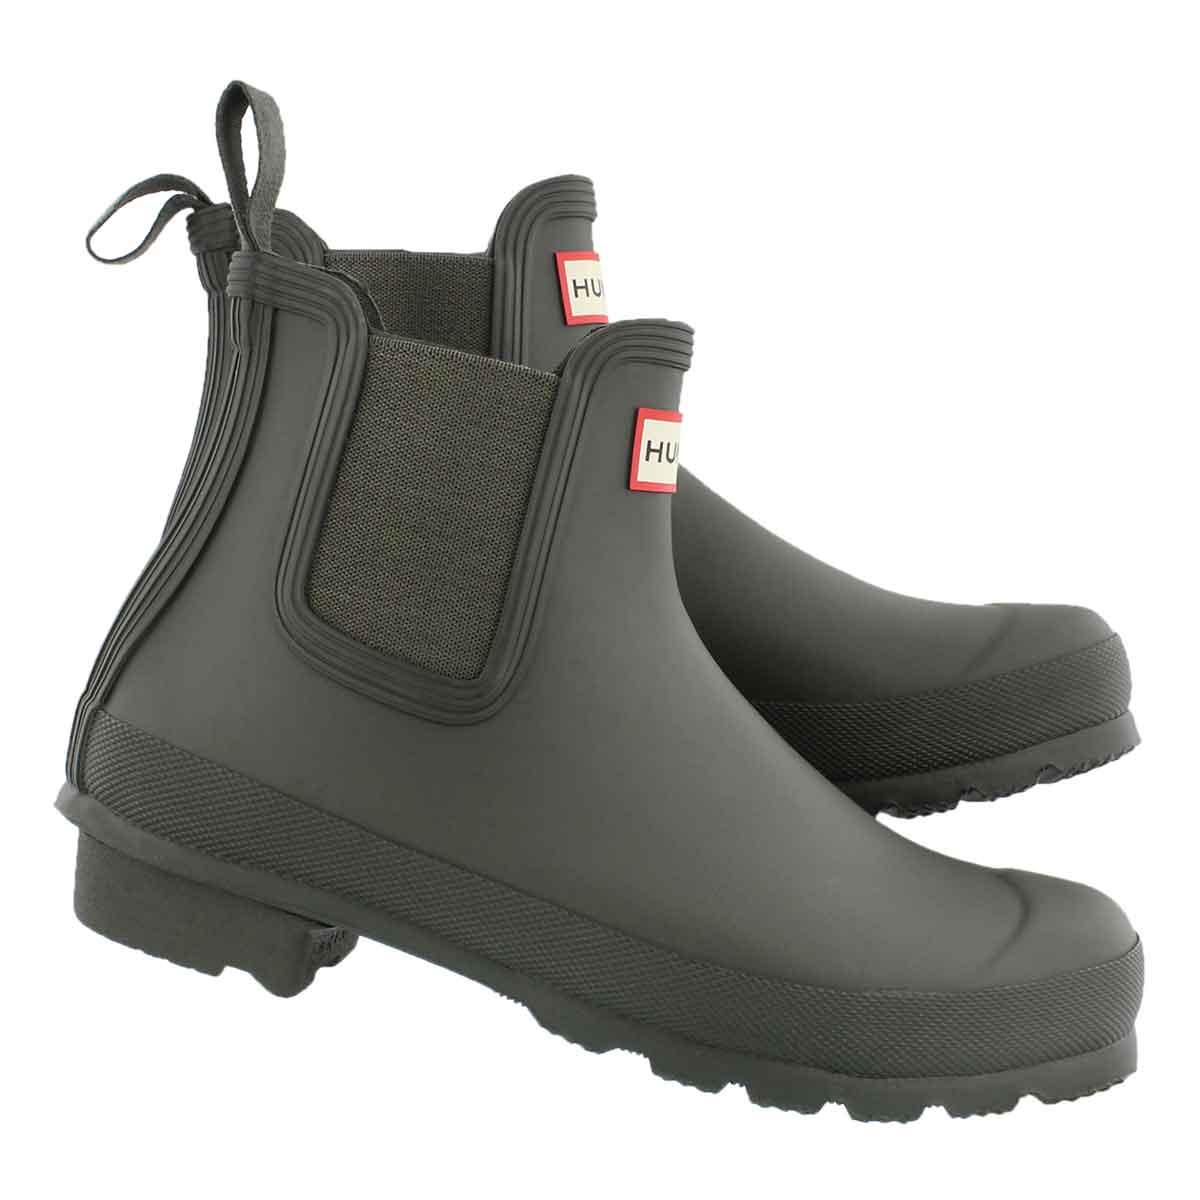 Lds Orig. Chelsea dark olive rain boot